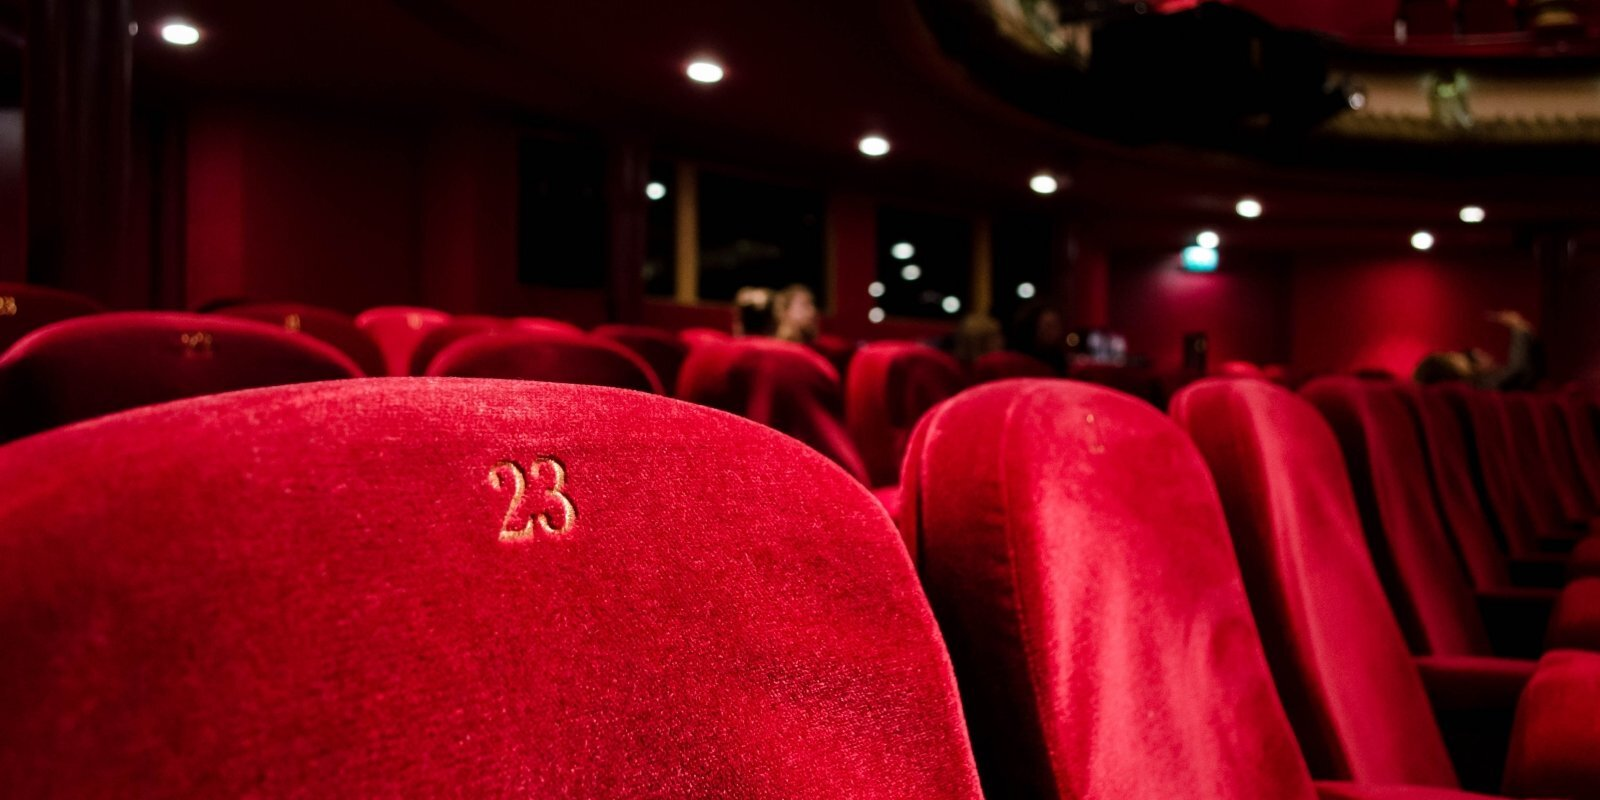 'Kino Citadele' notiks divi pilotseansi apmeklētājiem ar Covid-19 sertifikātu